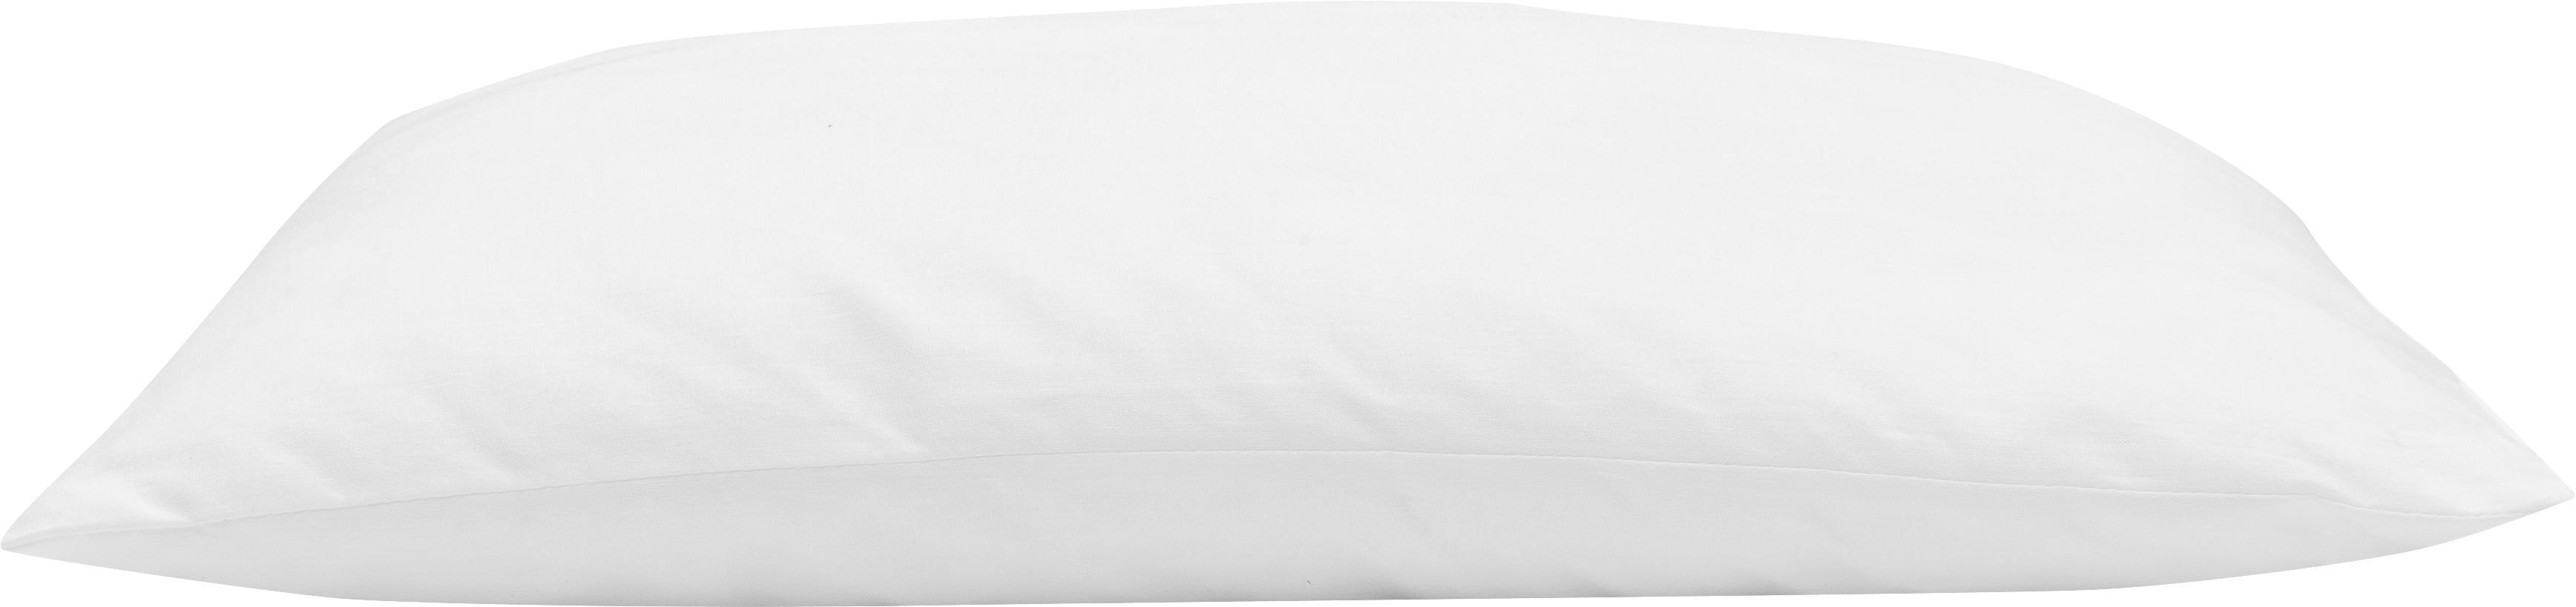 Relleno de cojín de microfibras Sia, 45x45, Funda: 100%algodón, Blanco, An 45 x L 45 cm